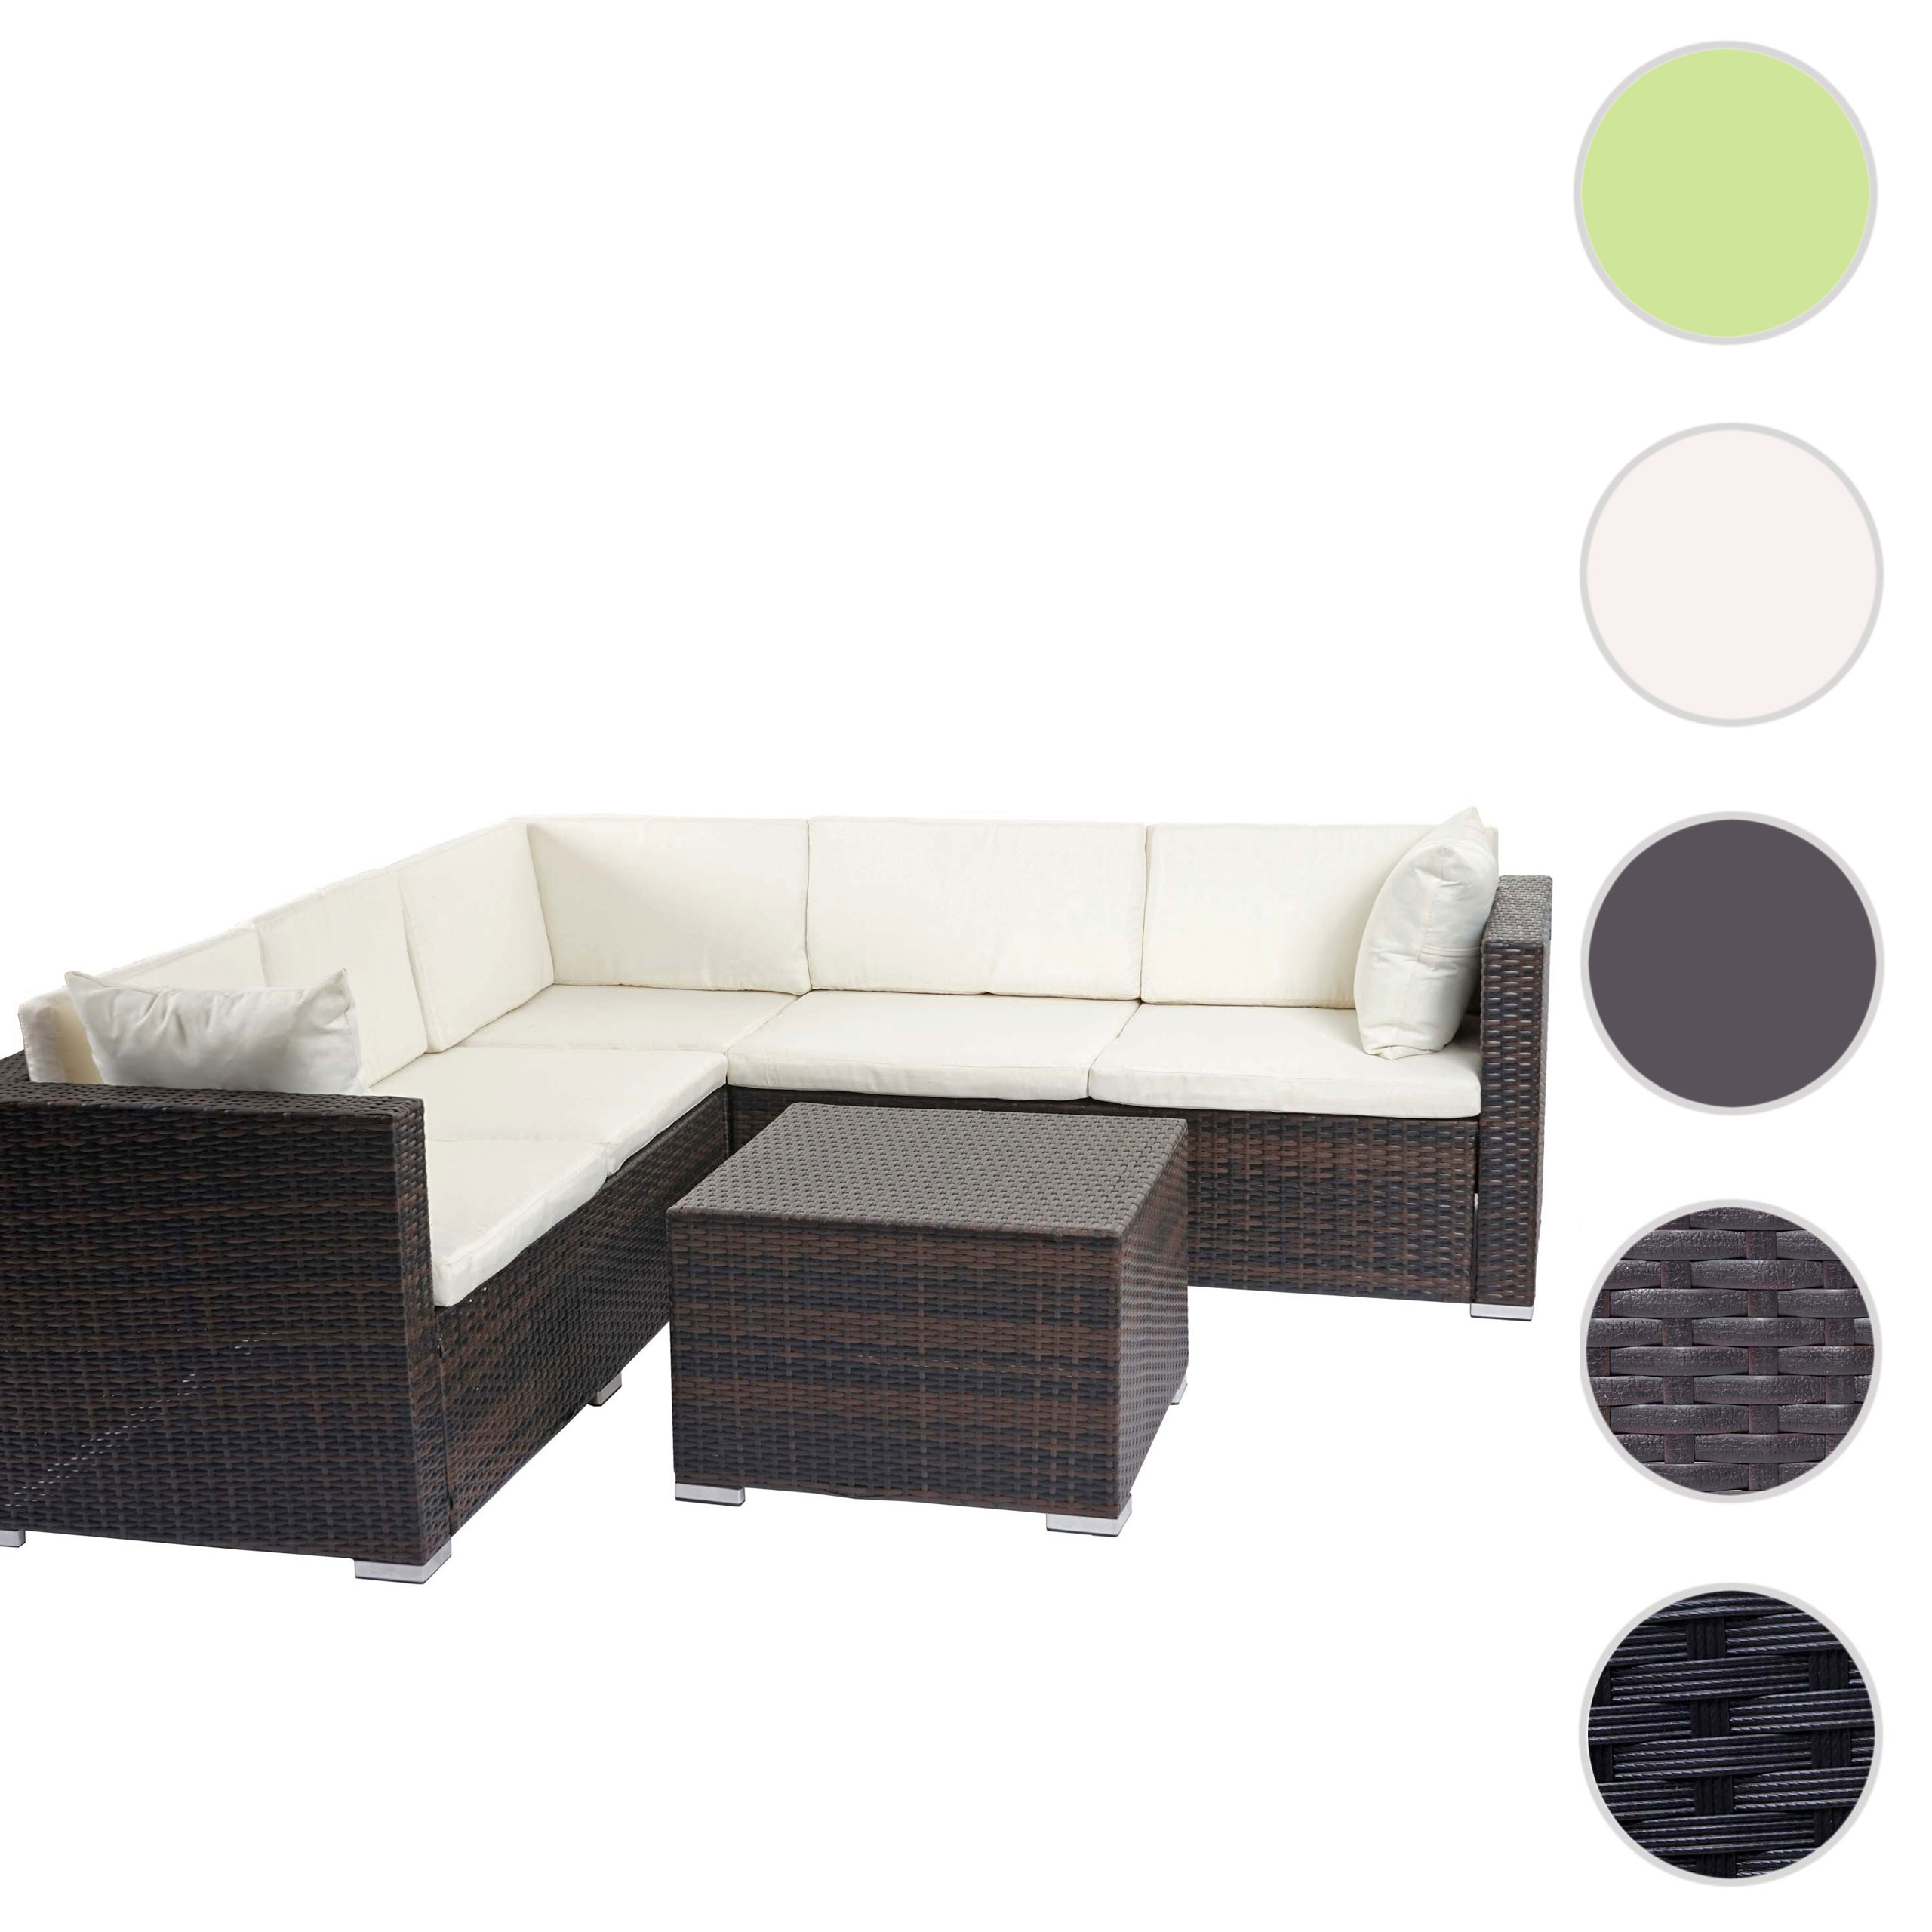 Full Size of Rattan Corner Sofa Cover Argos Cushion Covers Beds Uk Indoor Vintage Outdoor Cushions 5d894cd492829 Billig Echtleder 3 Sitzer Grau Schlaffunktion Mega Bezug Sofa Rattan Sofa